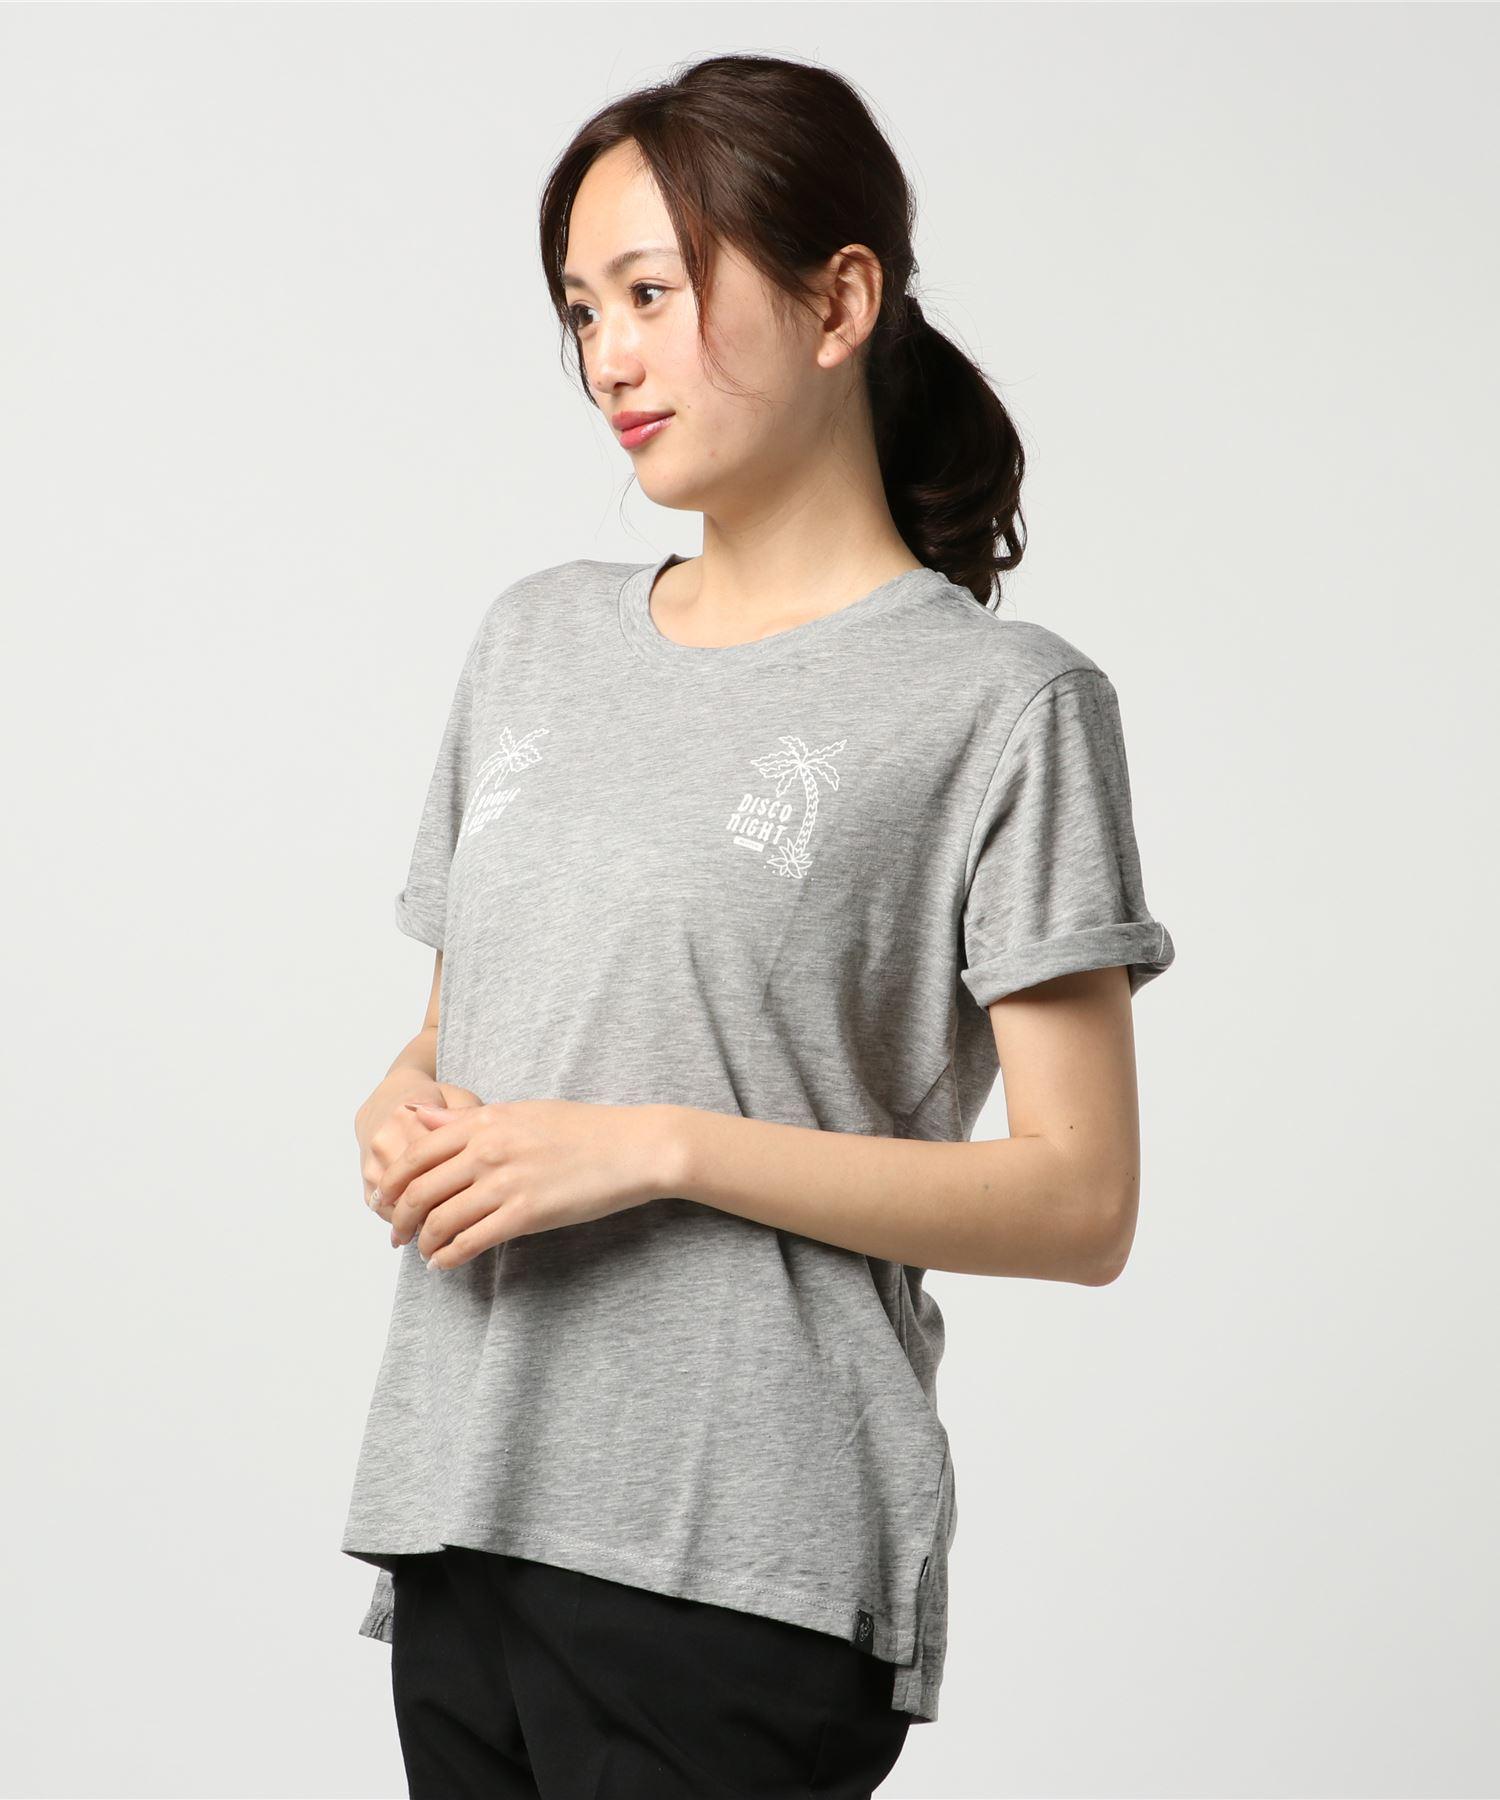 SCOTCH & SODA スコッチアンドソーダ / イレギュラーヘムロールアップスリーブTシャツ